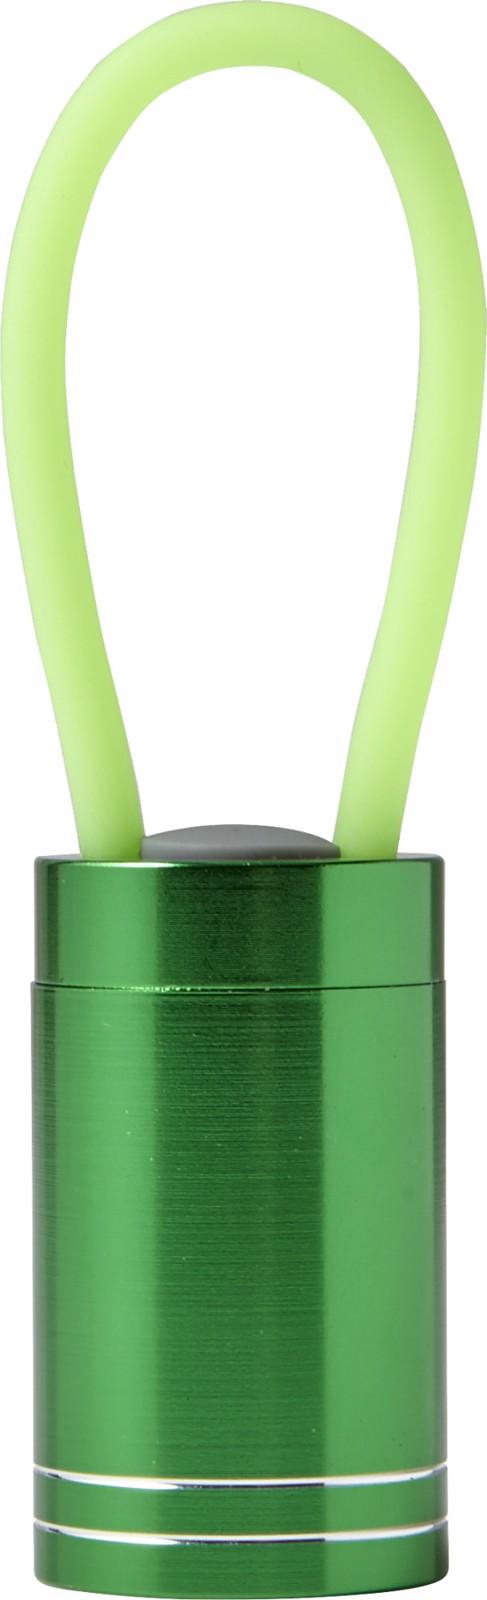 Aluminium torch - Light Green